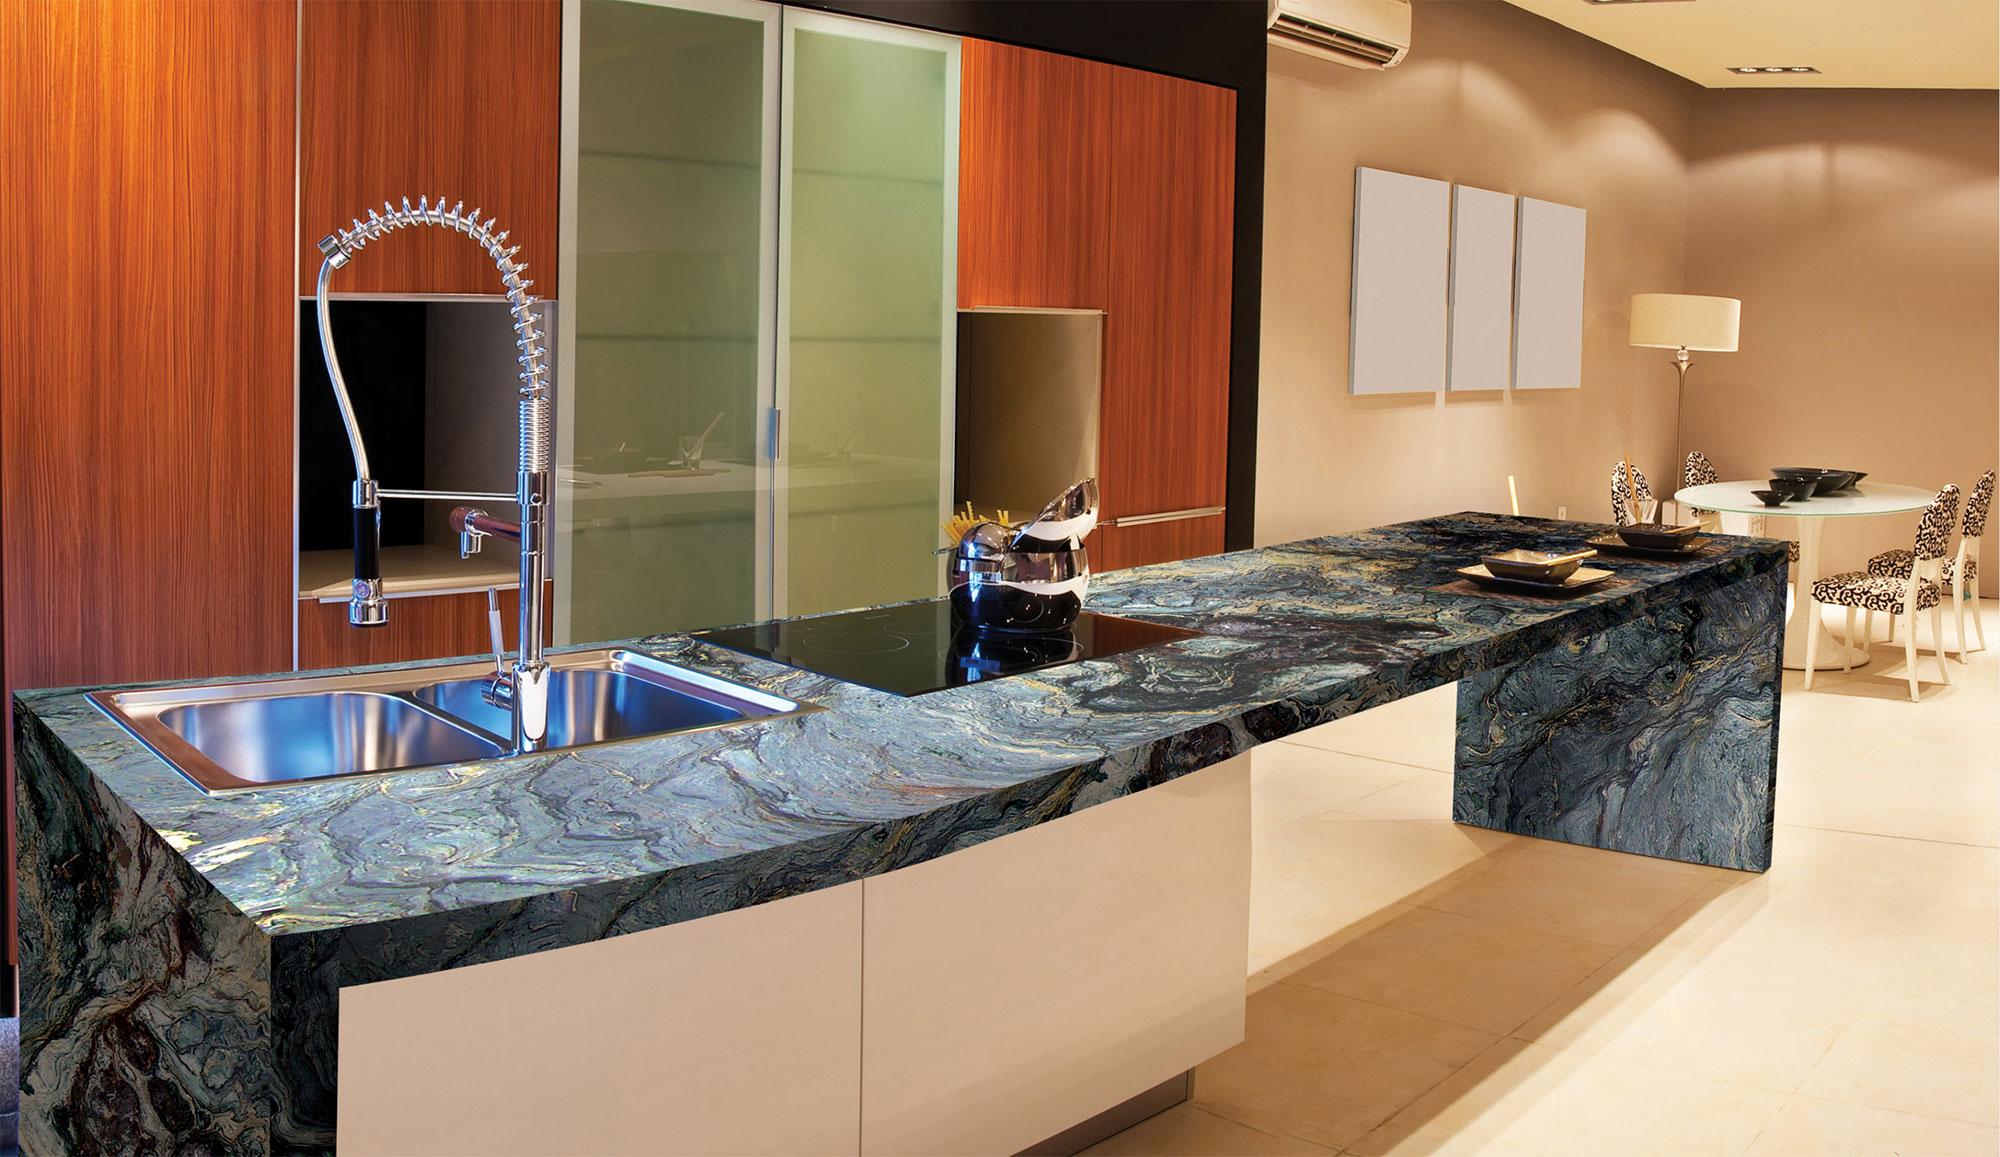 cheap sofas tampa fl sofa cama precios mexico granite countertops elegant countertop with